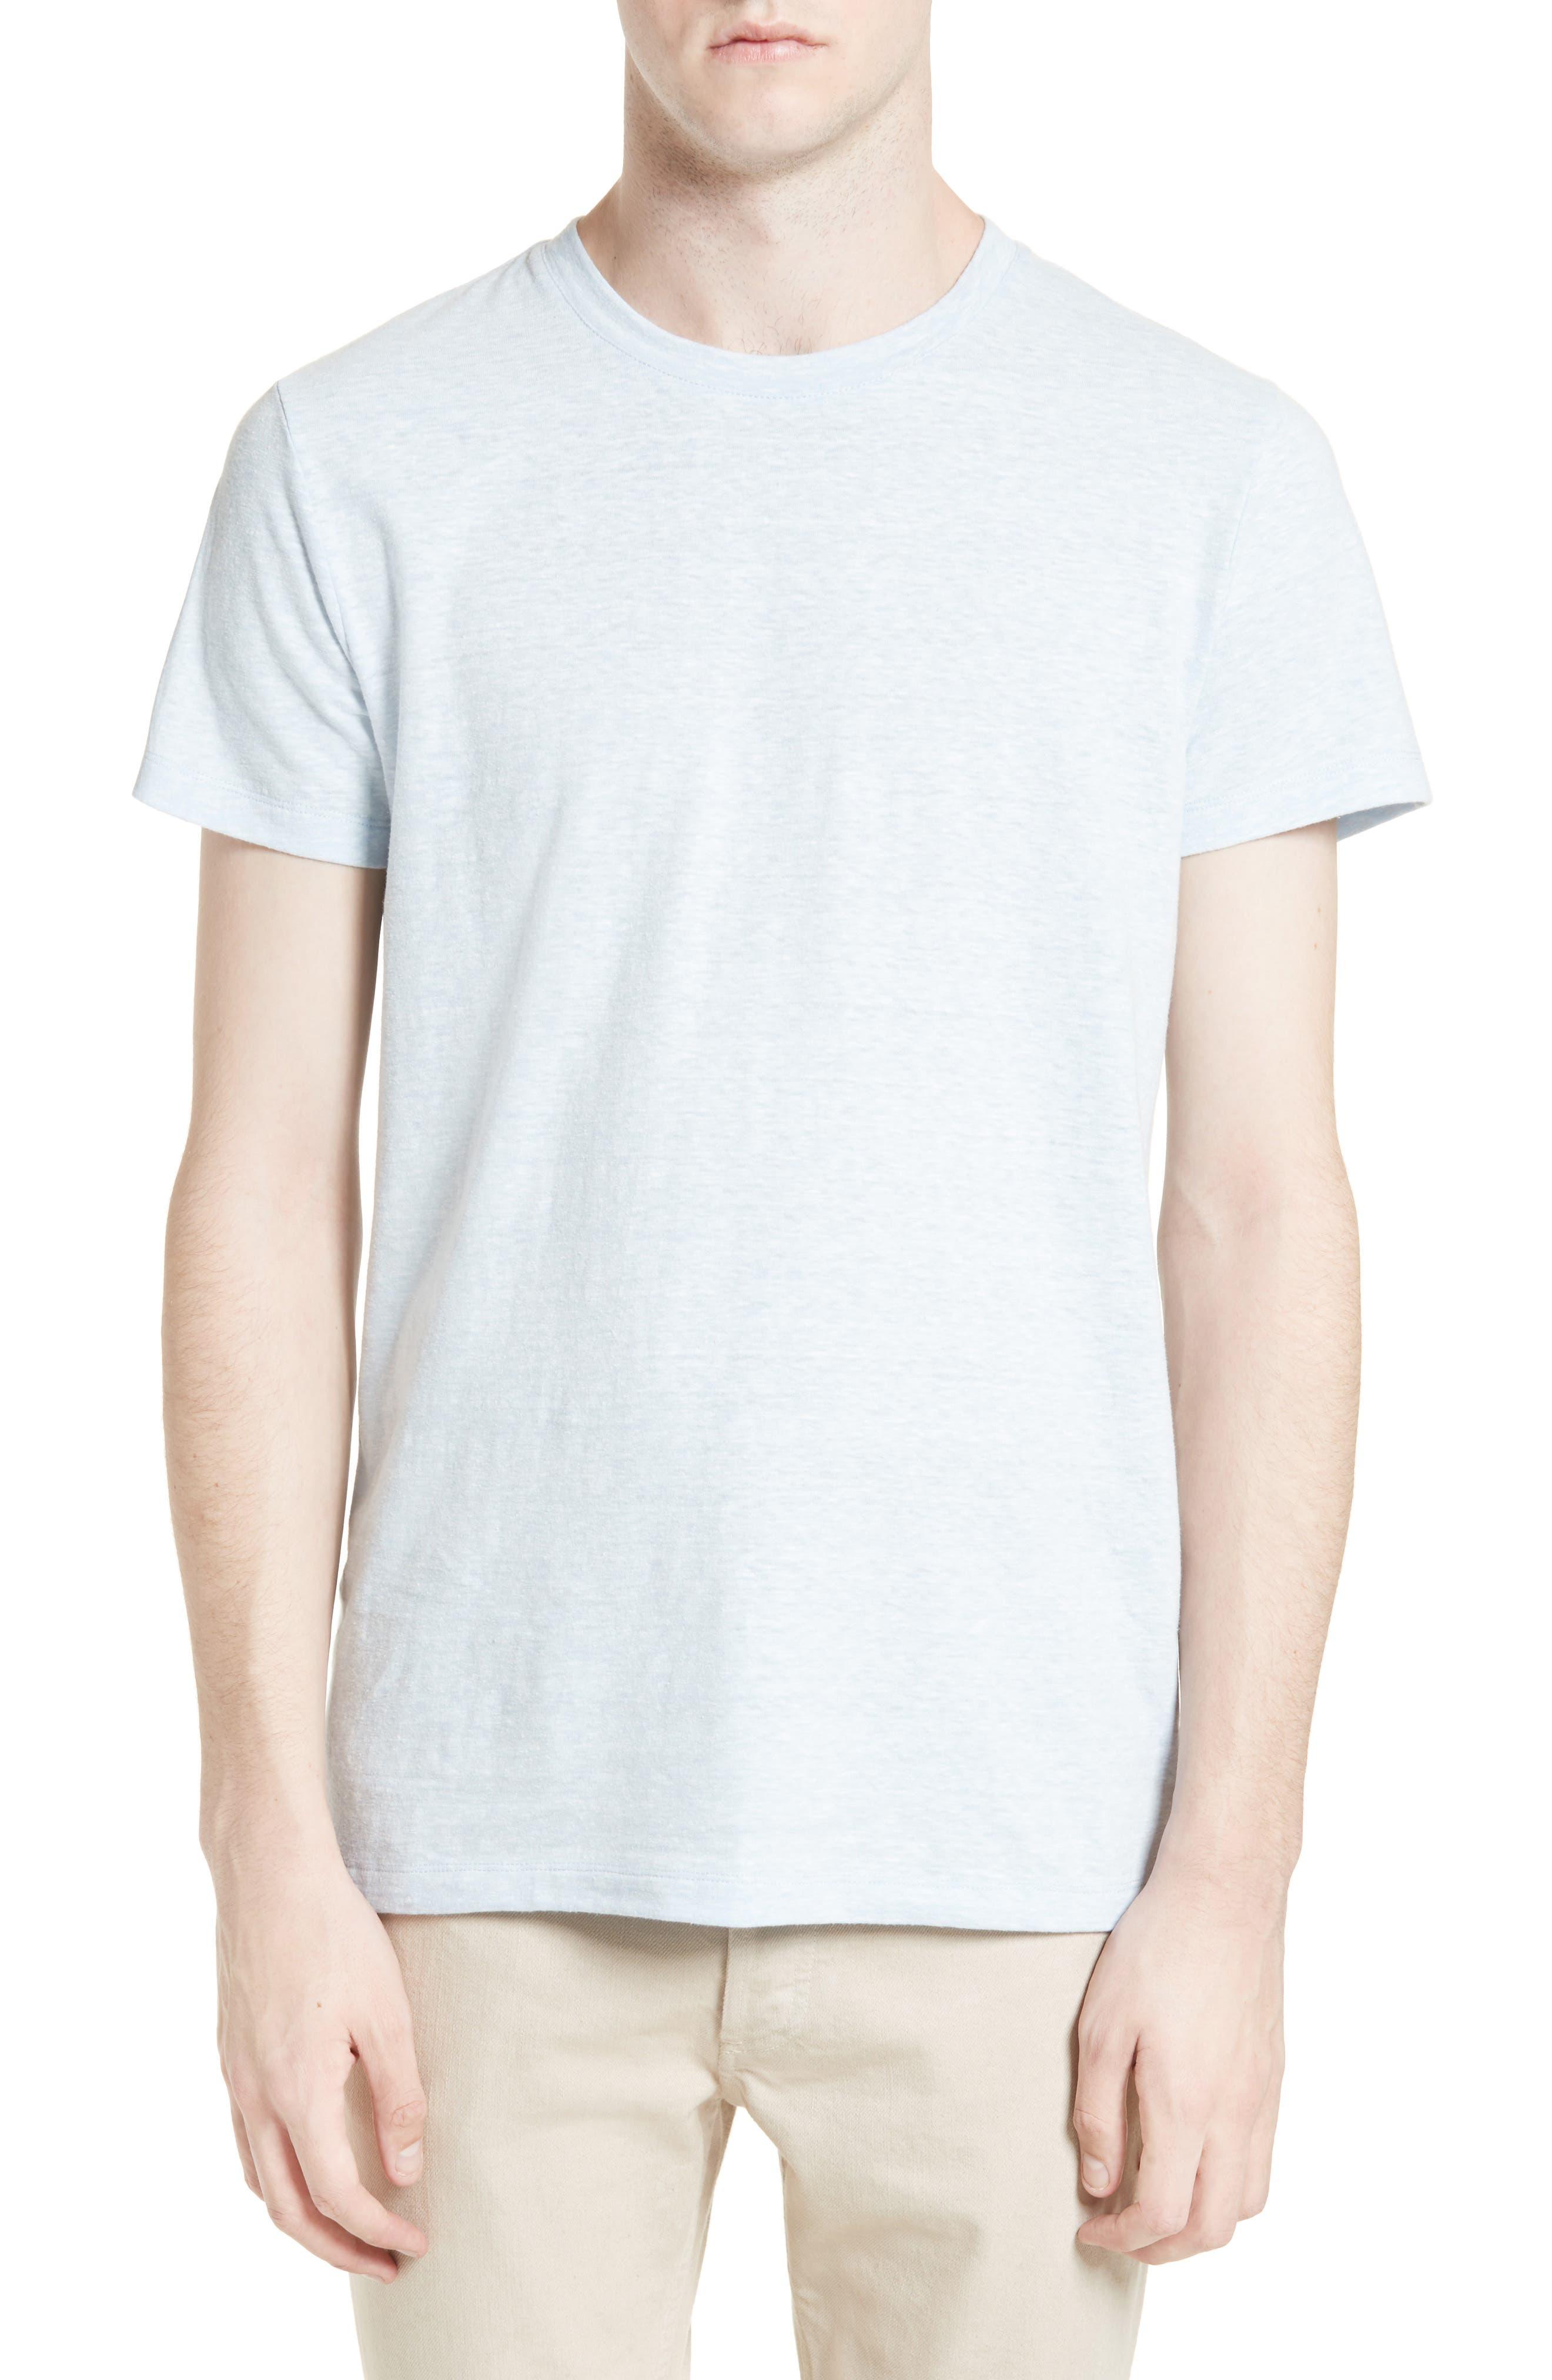 Jimmy T-Shirt,                             Main thumbnail 1, color,                             400